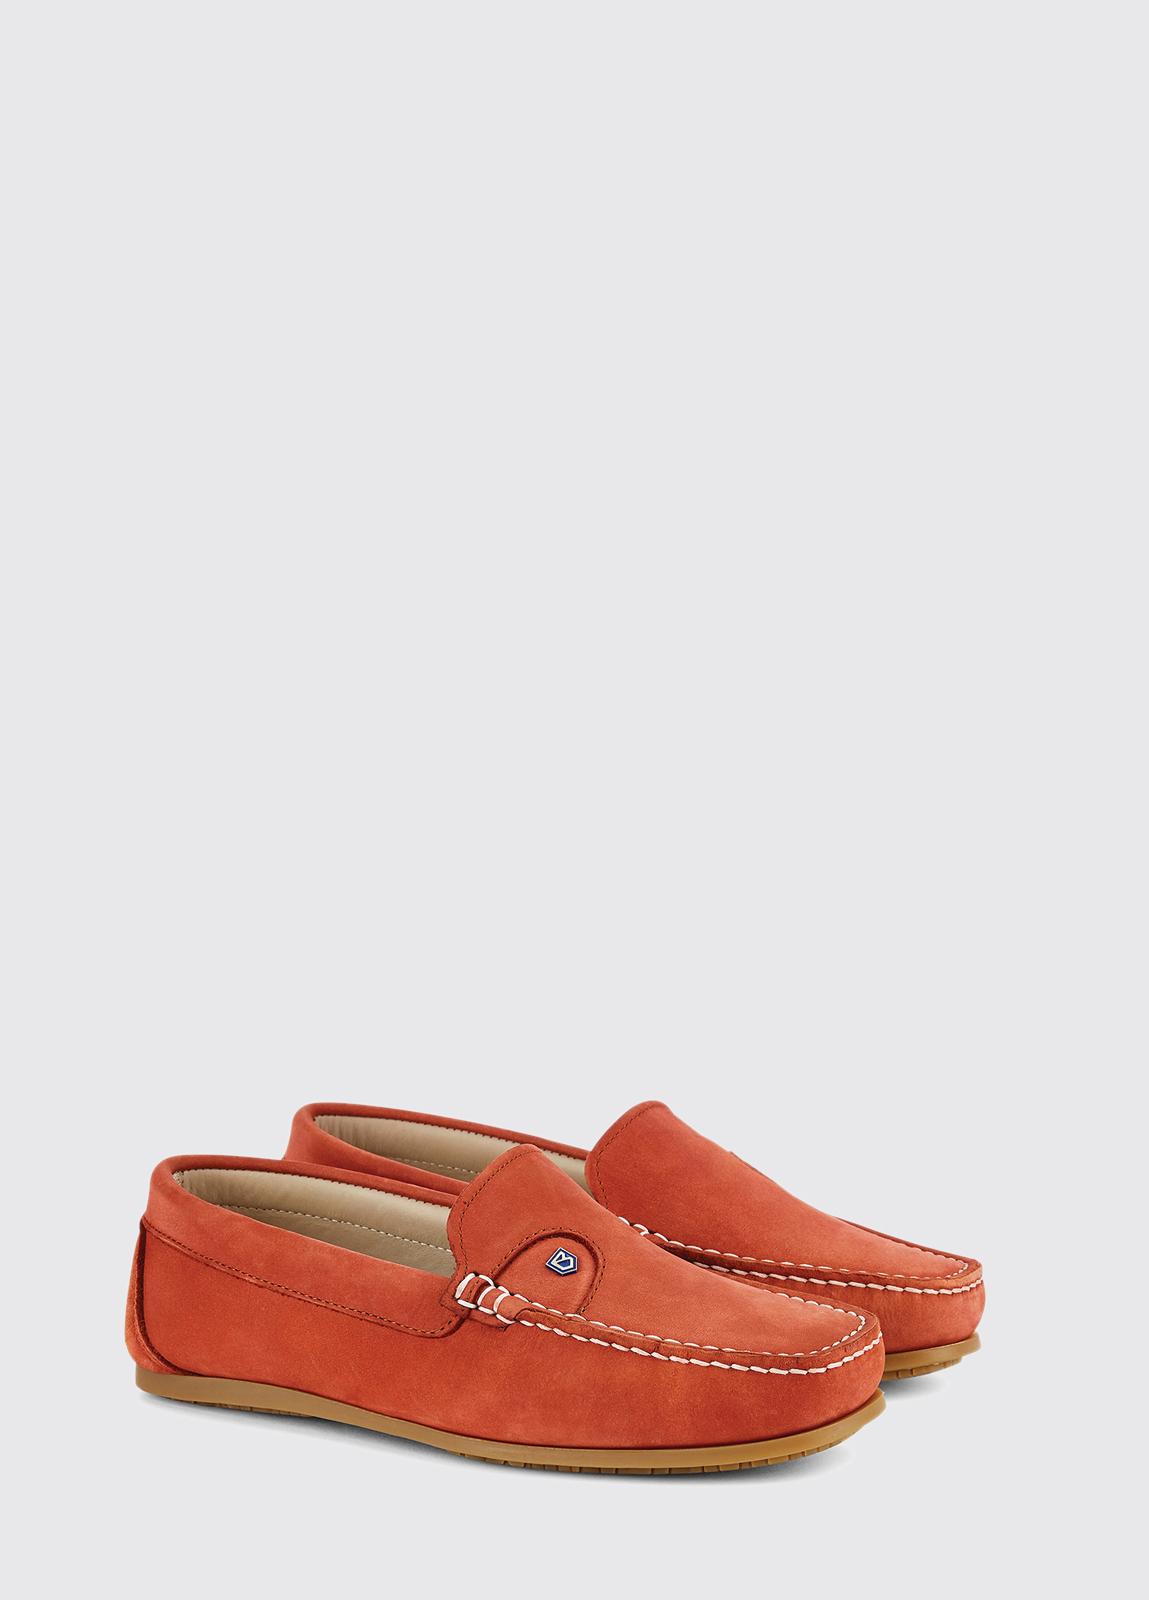 Bali Loafer - Terracotta